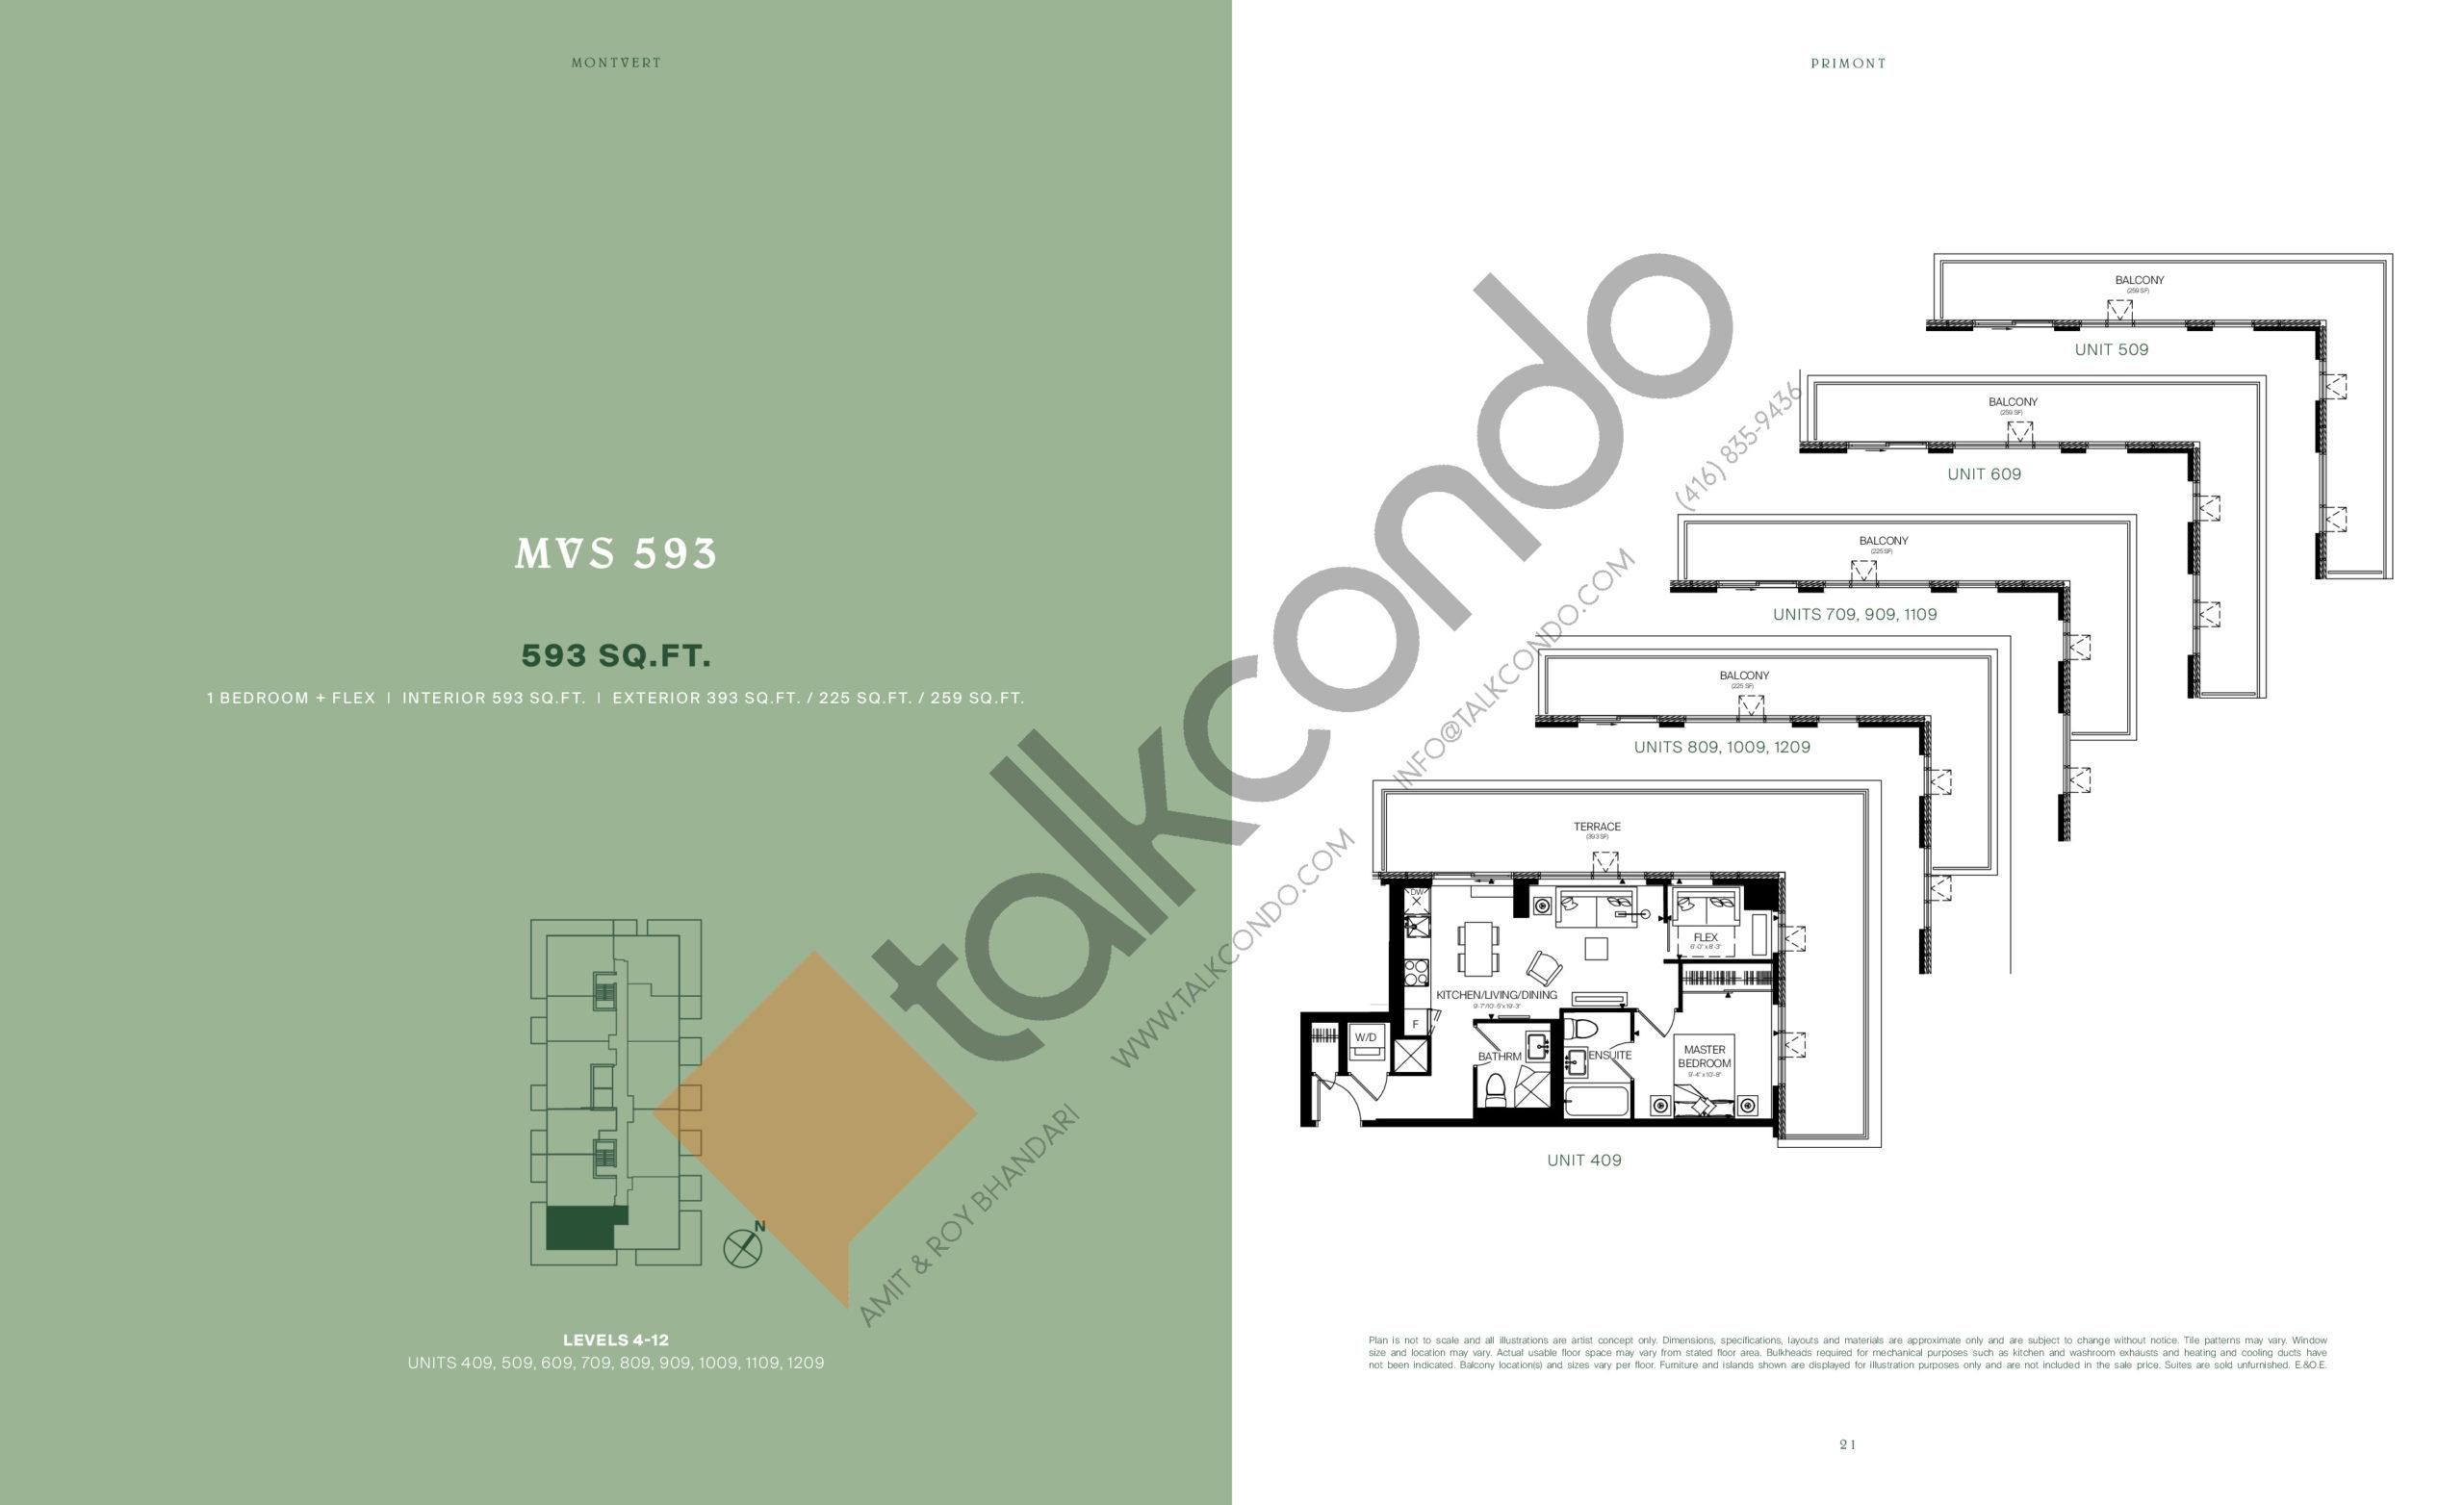 MVS 593 Floor Plan at MontVert Condos - 593 sq.ft